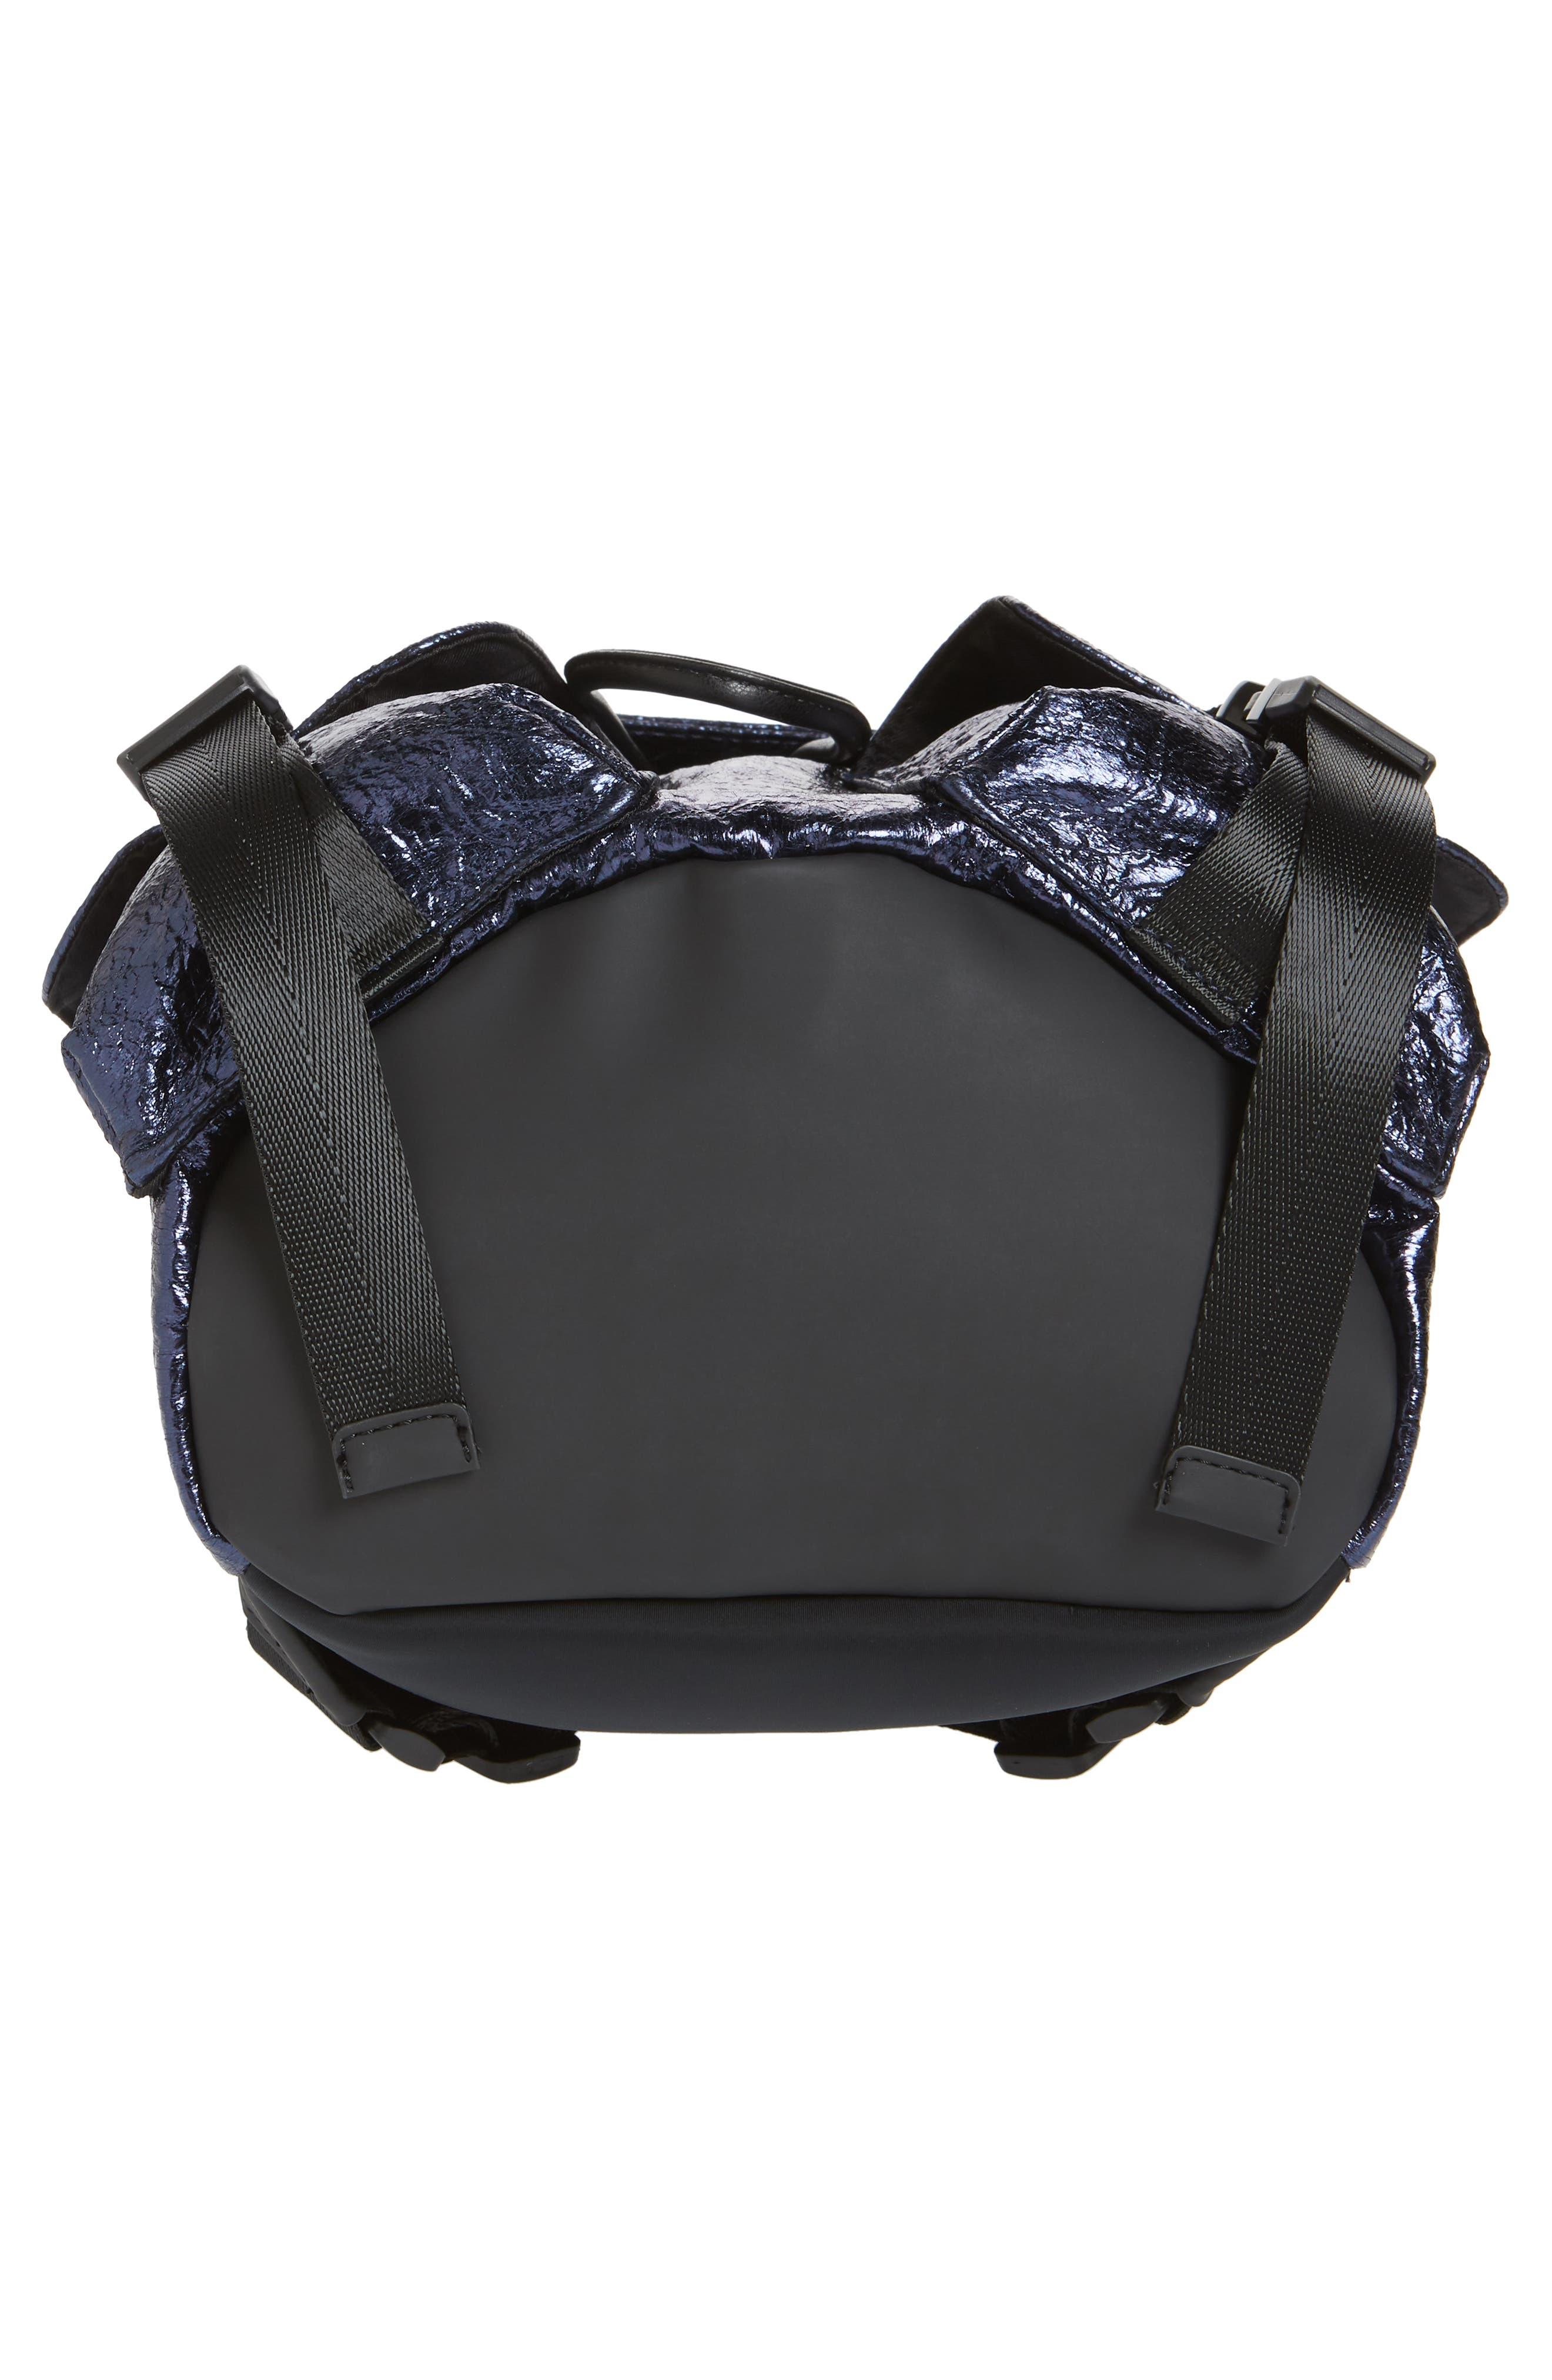 KENDALL + KYLIE,                             Parker Metallic Water Resistant Backpack,                             Alternate thumbnail 6, color,                             400